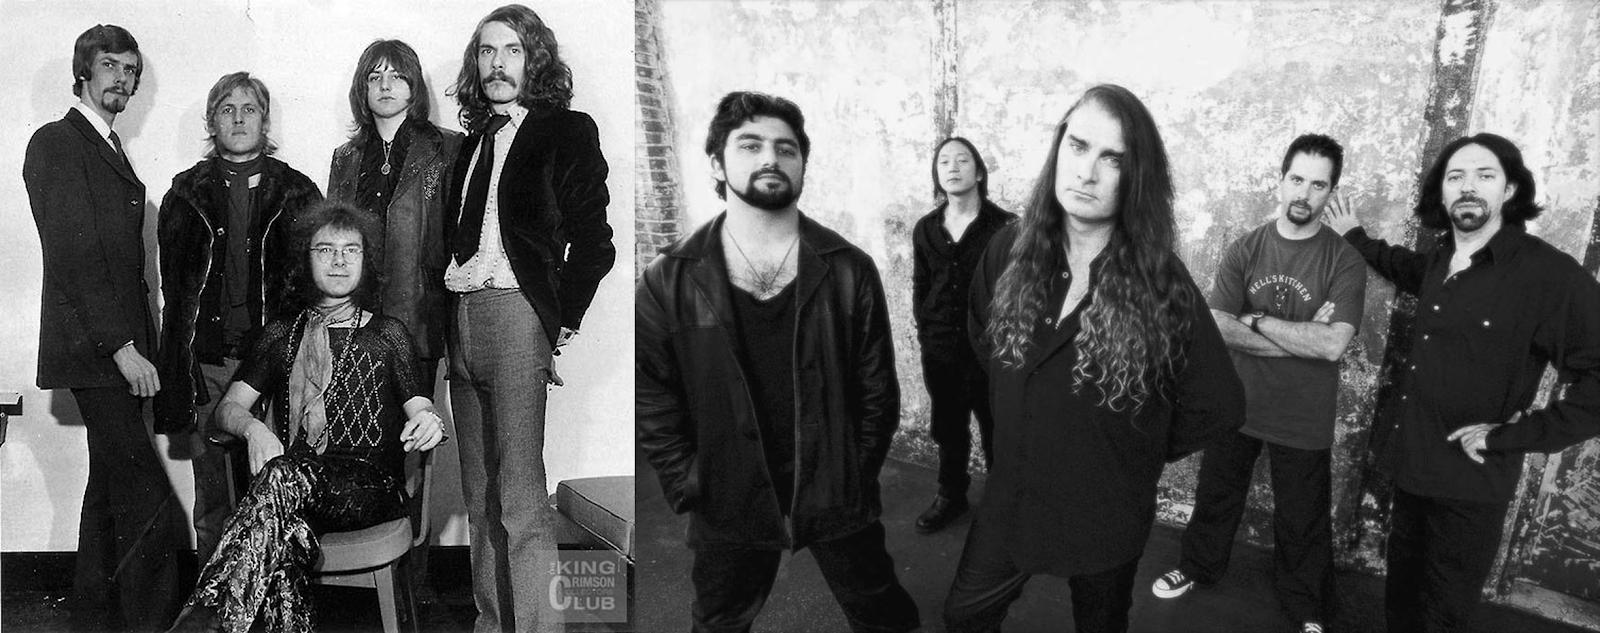 Cuartos de final: King Crimson vs. Dream Theater Mi%25C3%25A9rcoles